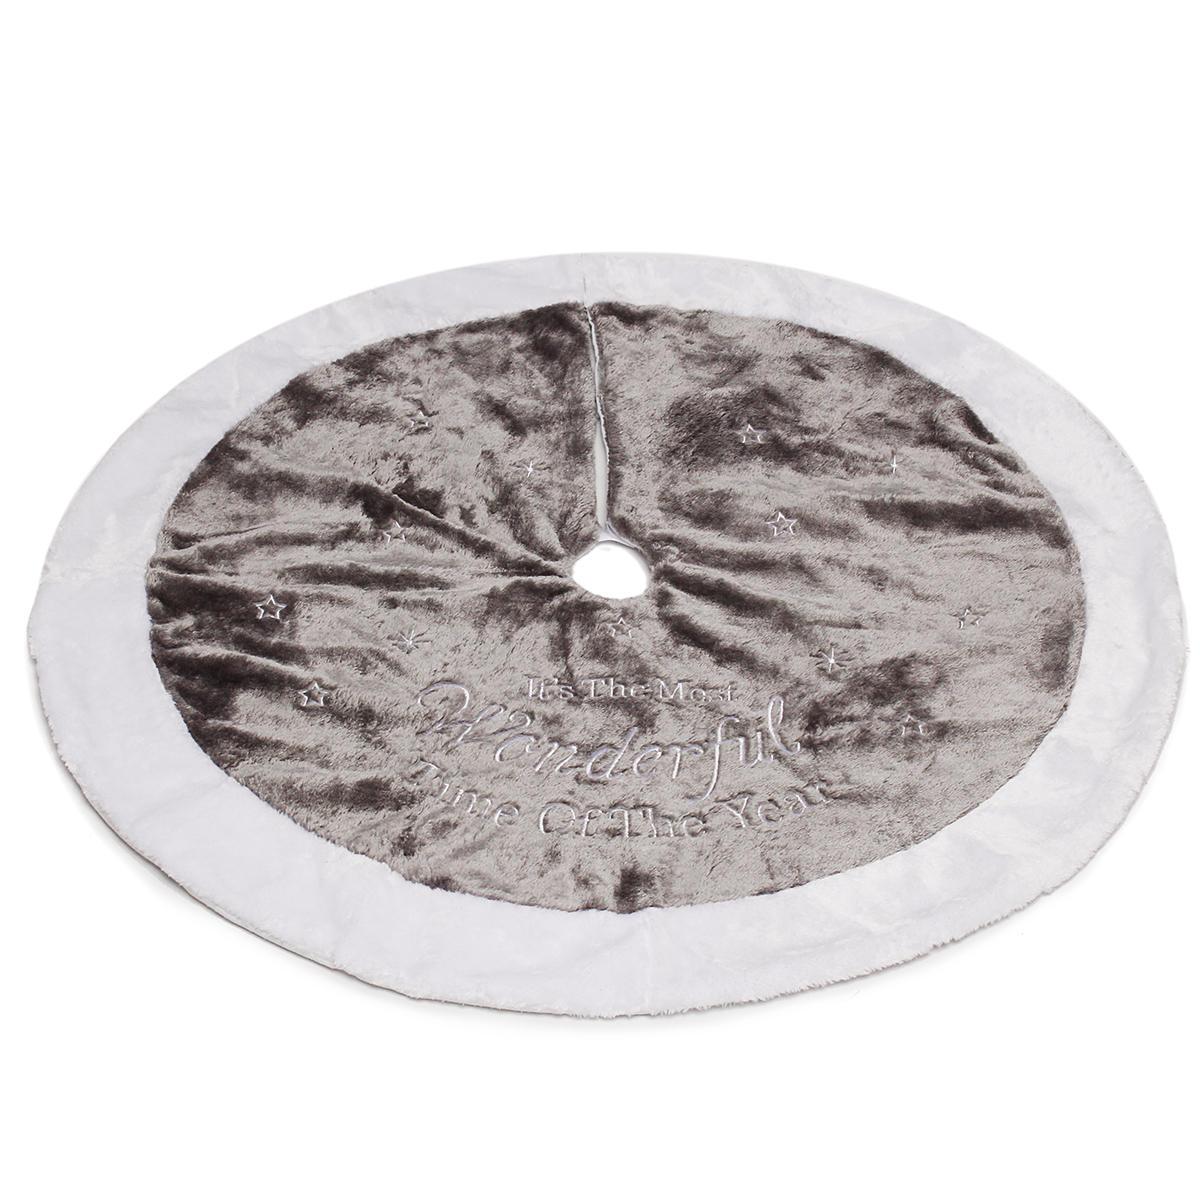 Decorazioni per massaggiatori manuali per albero di Natale da 90 cm Cuscino per pavimenti di peluche